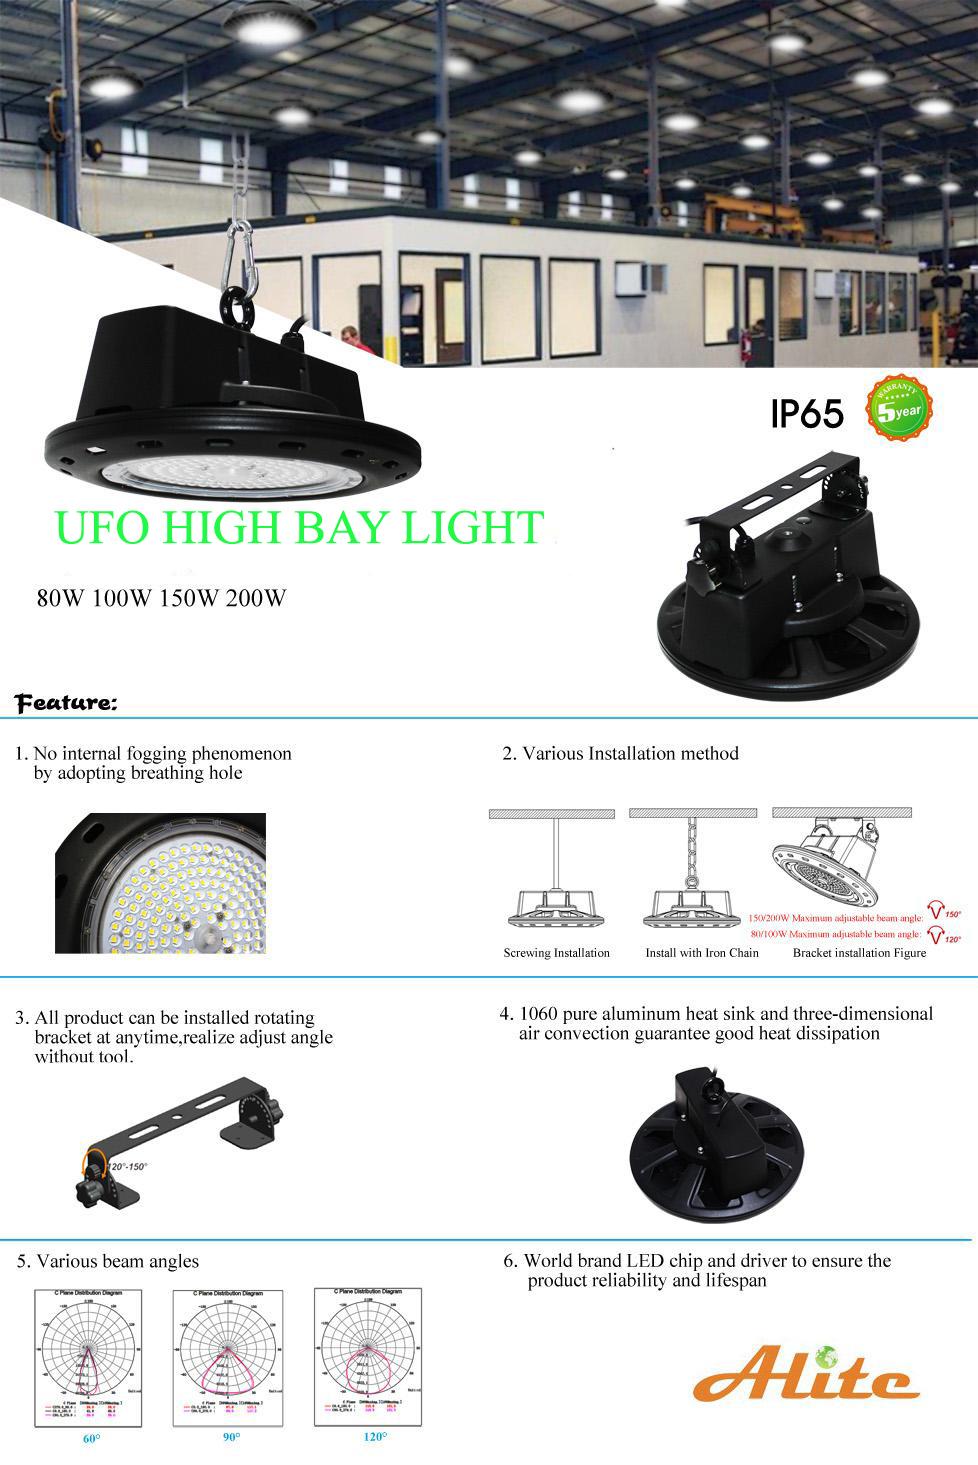 UFO HIGH BAY LIGHT-1